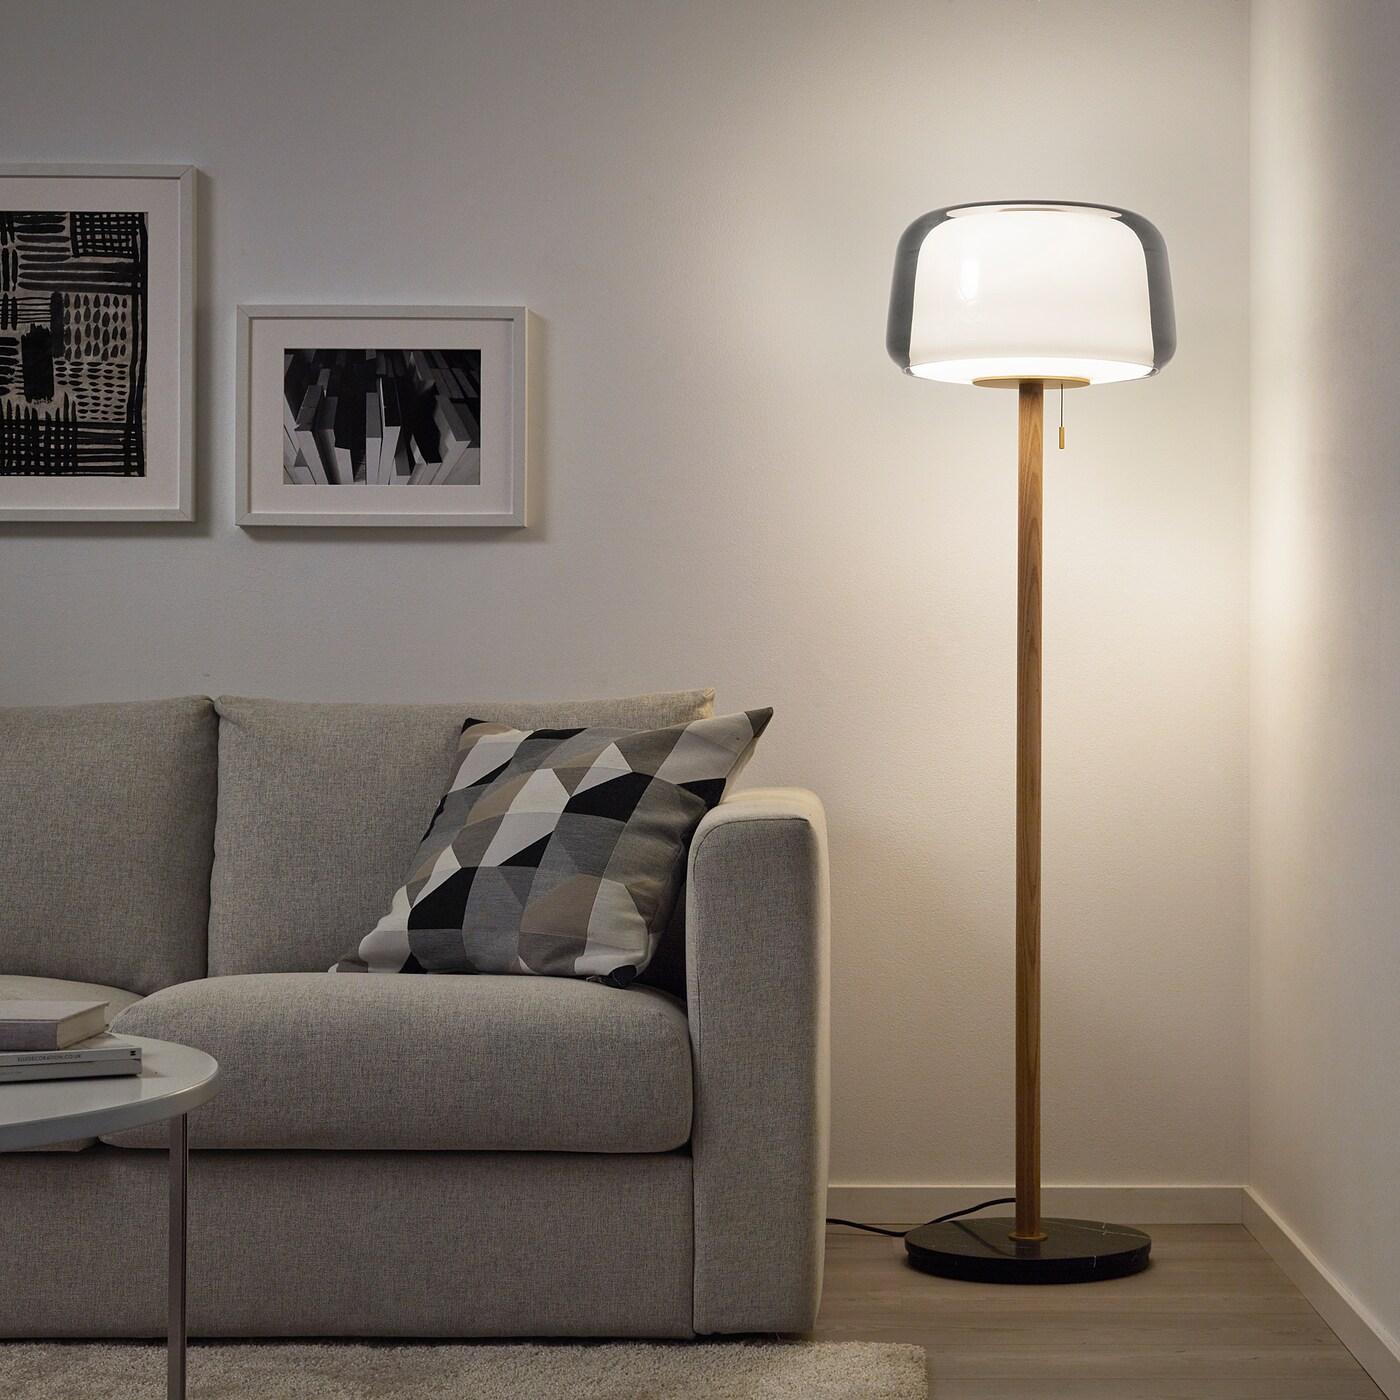 Evedal Standleuchte Grau Marmor Grau Ikea Deutschland